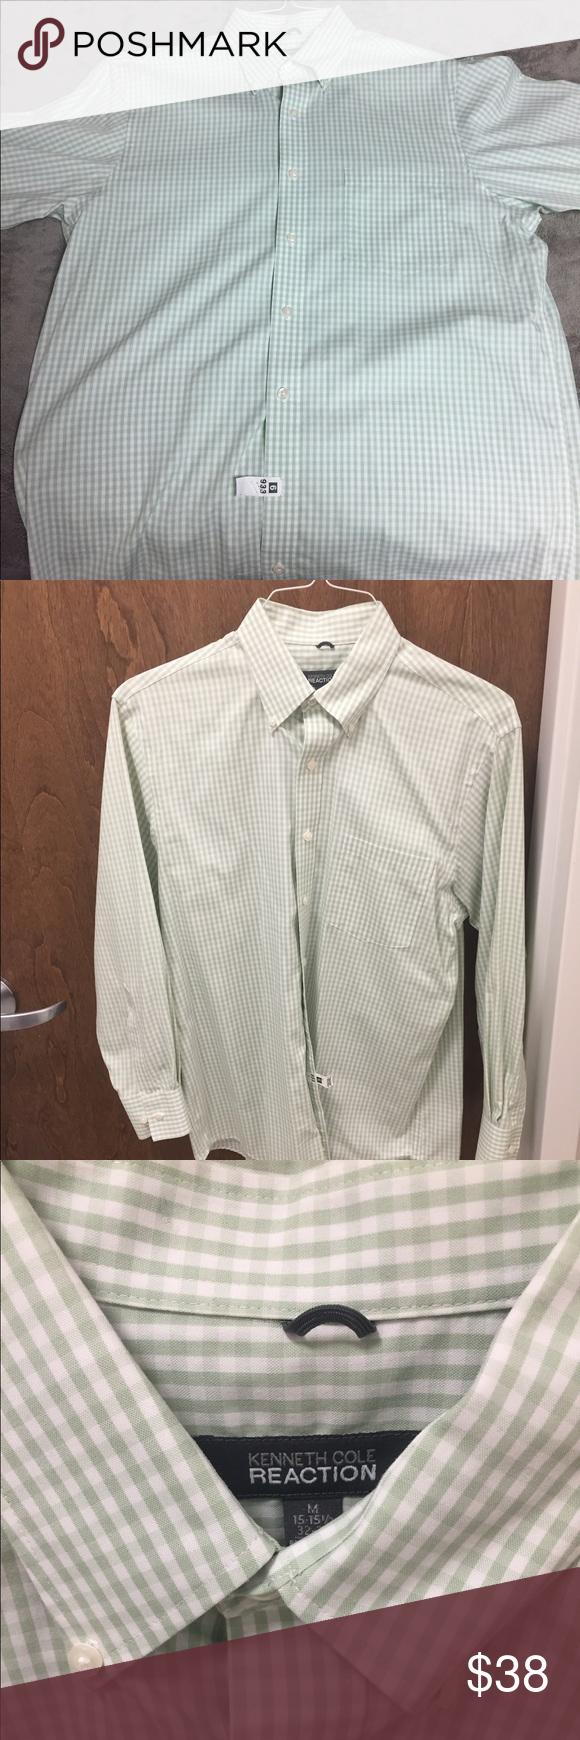 Kenneth cole reaction long sleeve dress shirt dress shirts